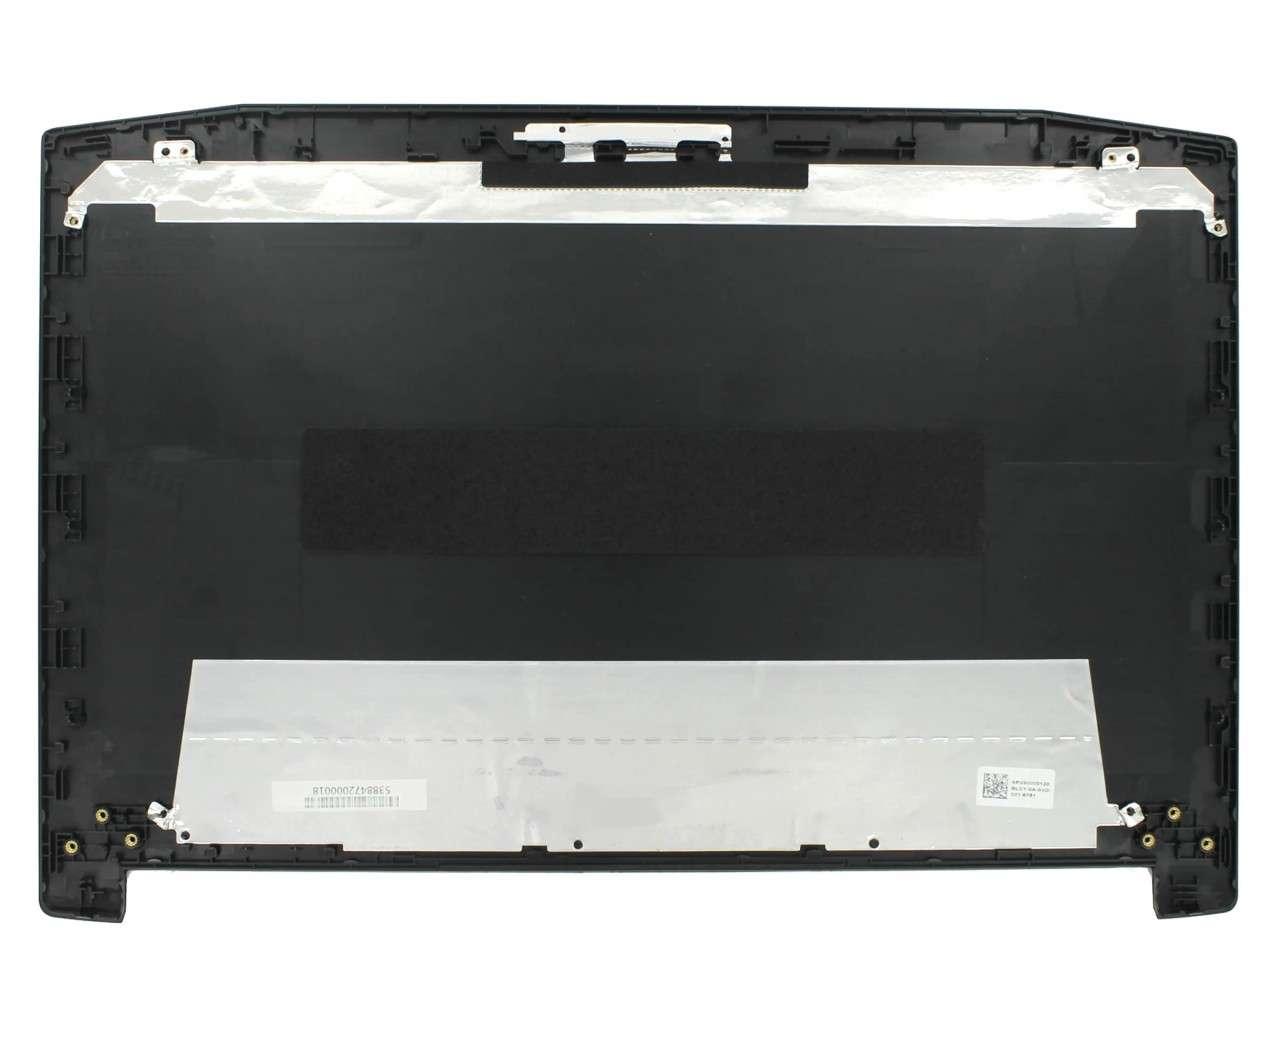 Capac Display BackCover Acer 60.Q2SN2.002 Carcasa Display imagine powerlaptop.ro 2021